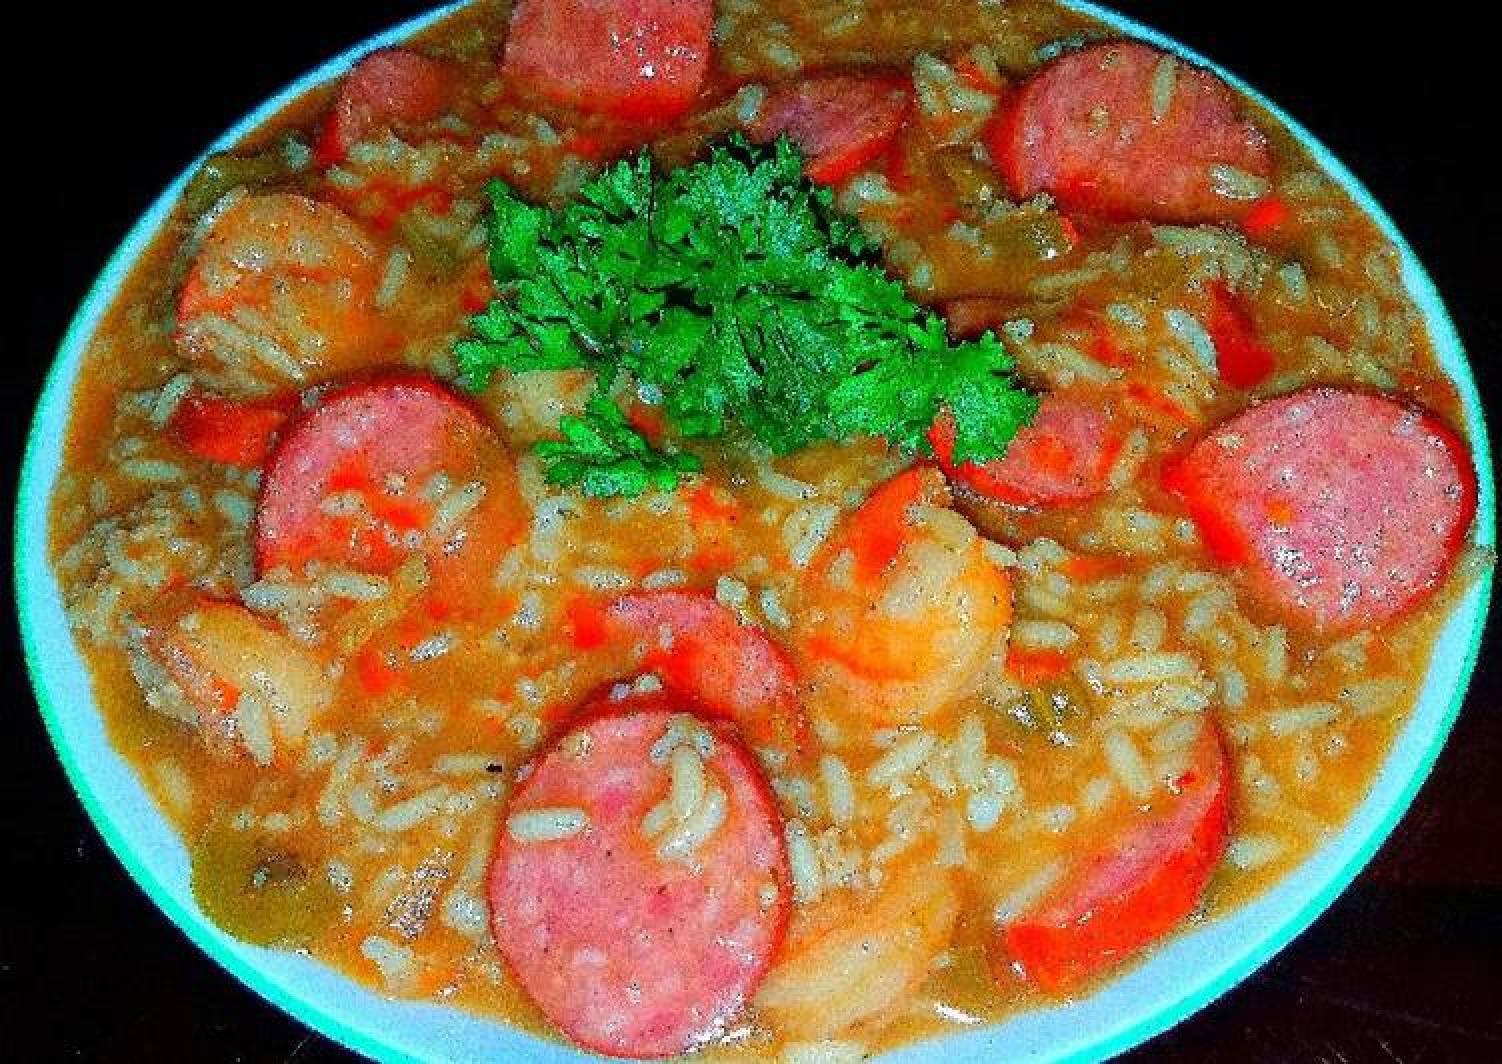 Mike's EZ Shrimp & Spicy Andouille Sausage Gumbo